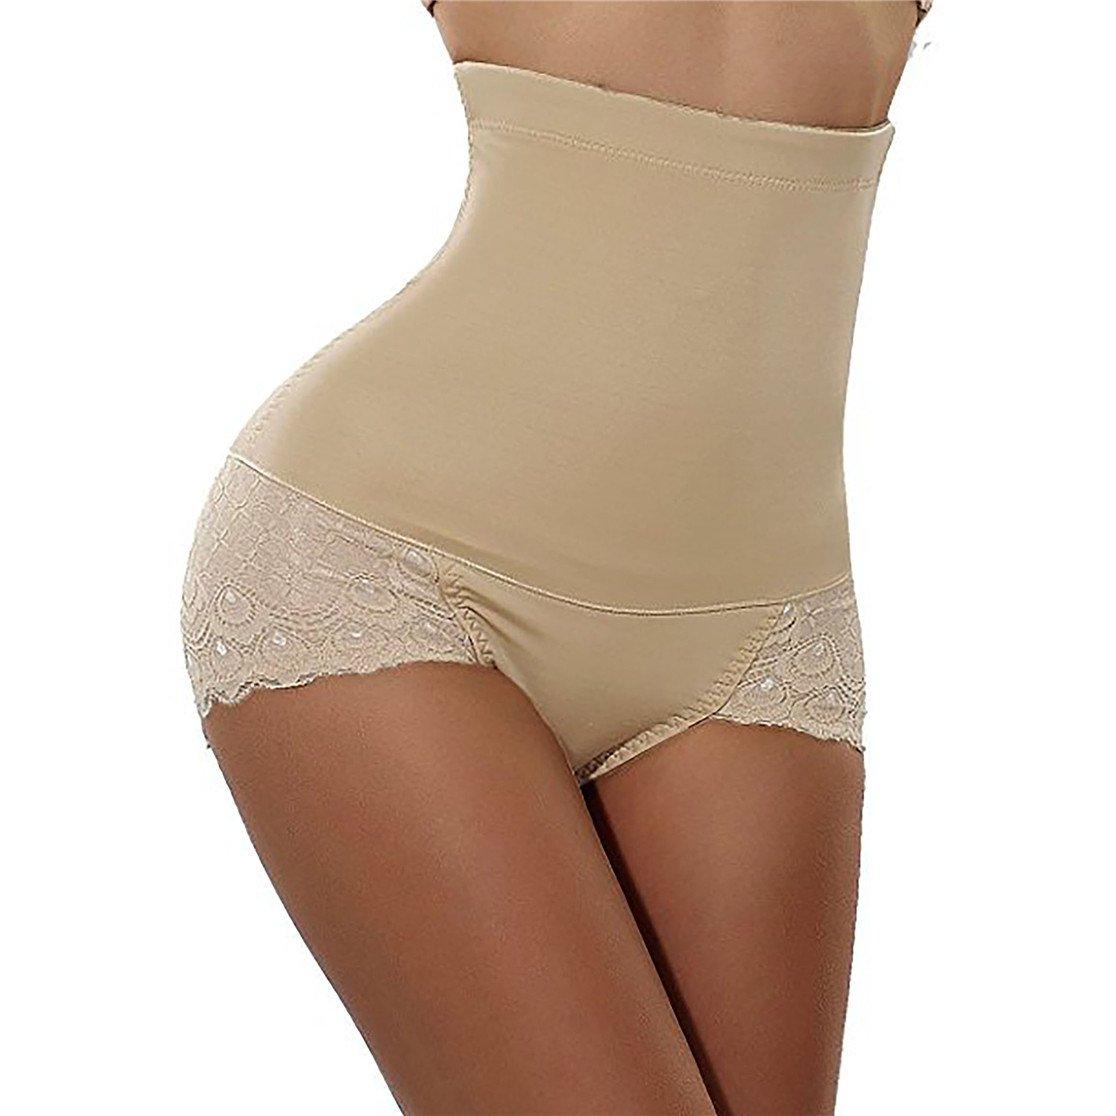 240b4e5645a5 Ursexyly Panty Hip Enhancer Brief, Magic Boy Short for Bigger Sexy Butt (L,